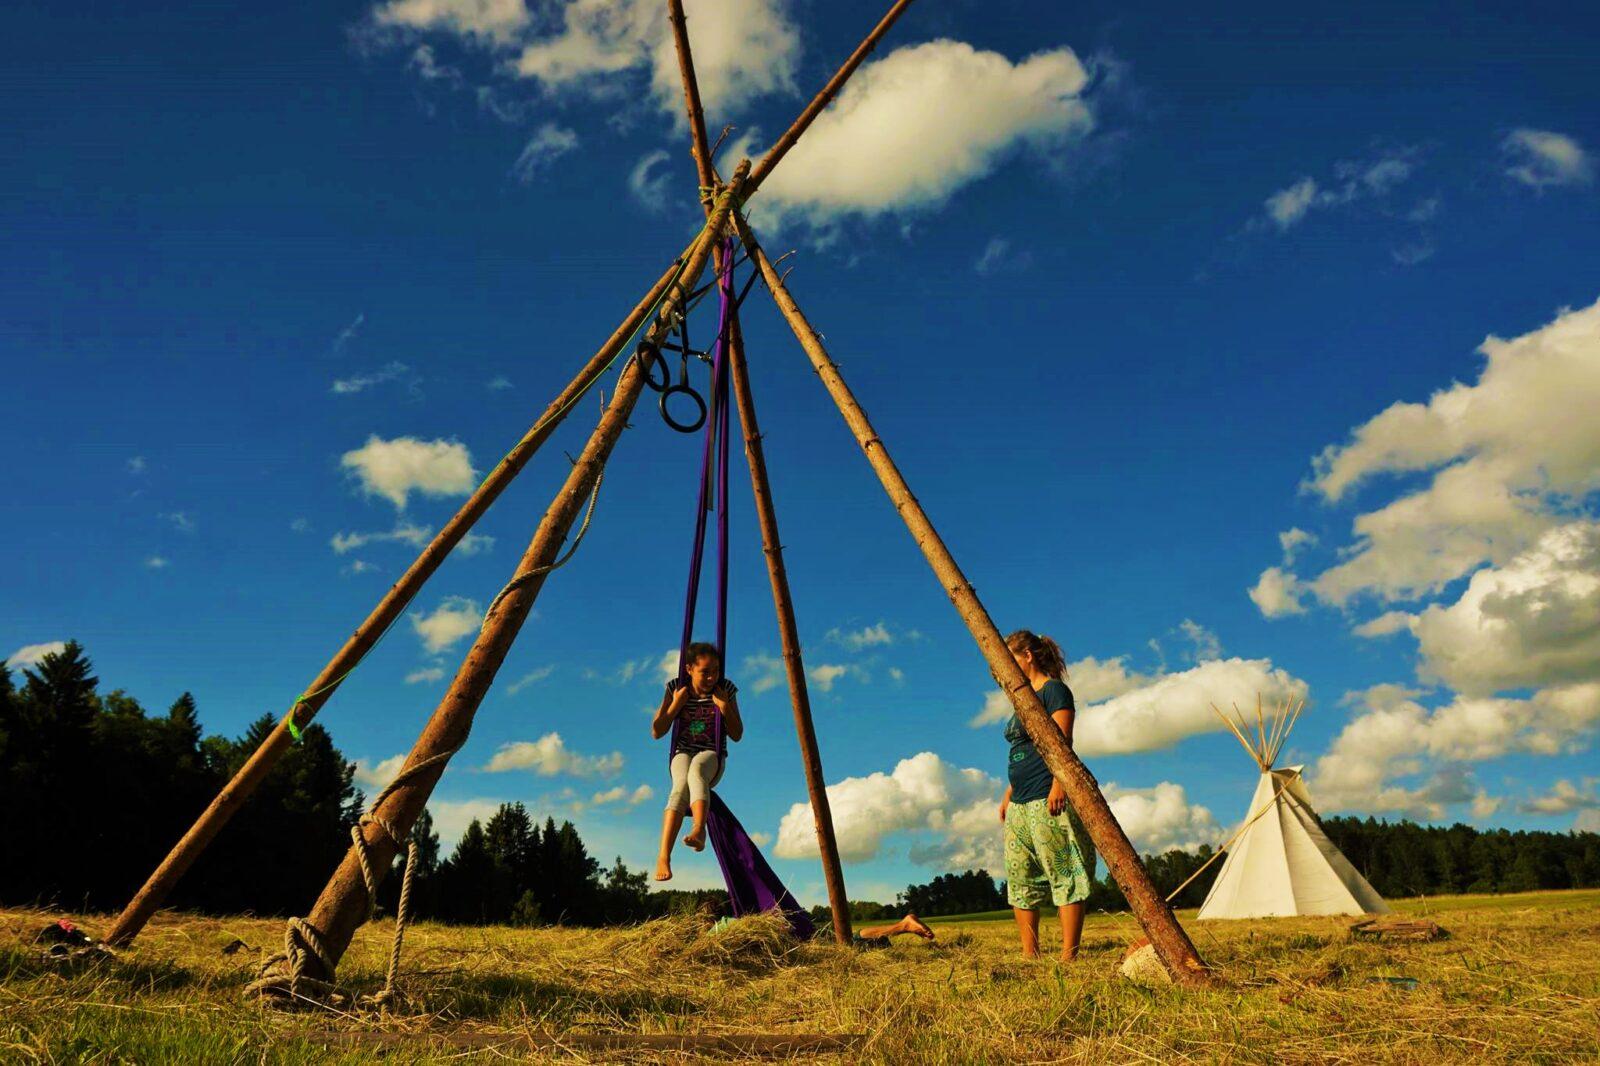 Festival of creativity, events, rainbow, gathering, family, hippies, tipi, spirituality, yoga, songwriting, art, music, dance